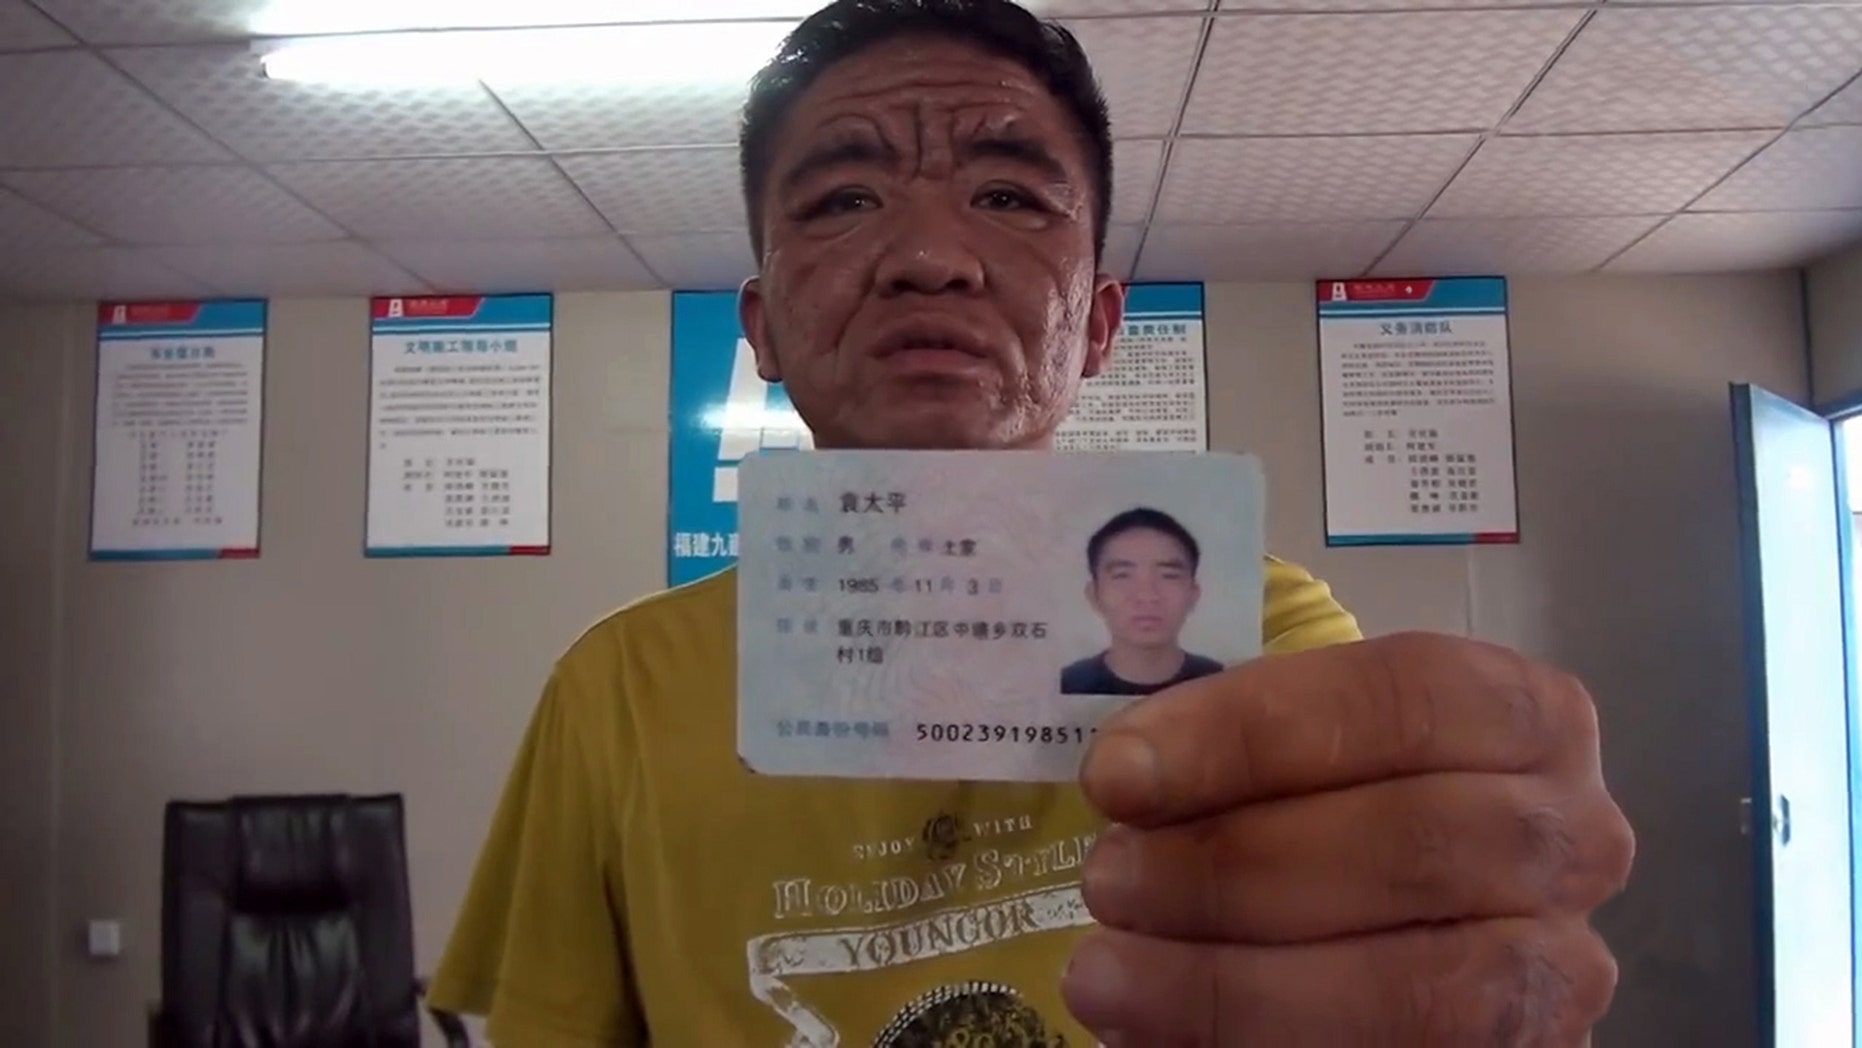 Yuan Taiping showing his ID; year of birth: 1985. (CEN)